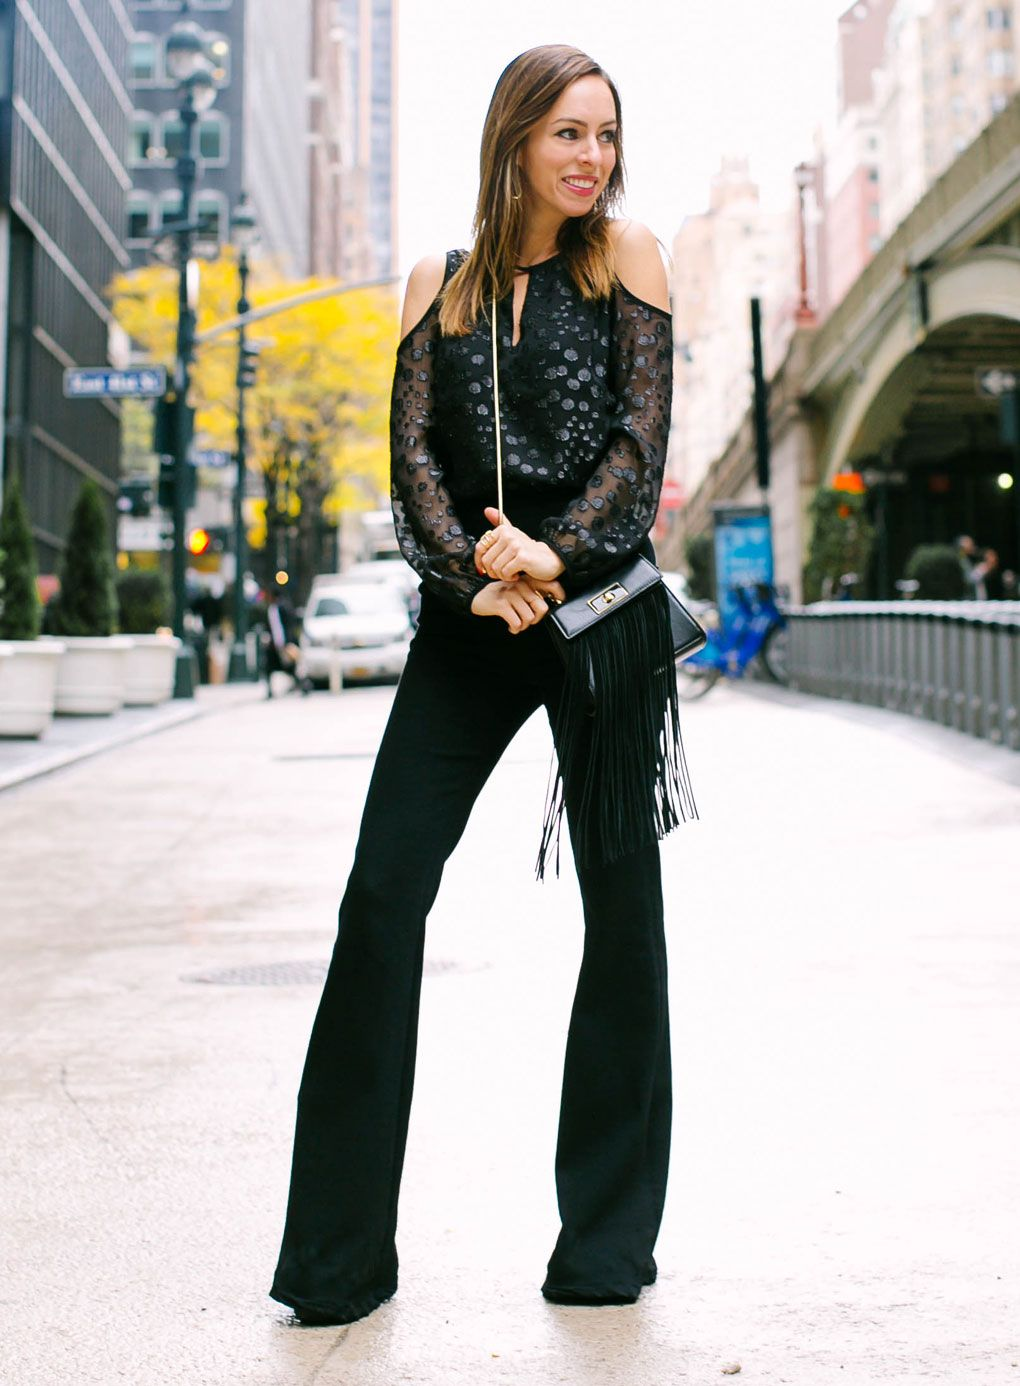 4253dc0d80886b Sydne Style - Los Angeles fashion blogger Sydne Summer shows how to wear  flared pants.